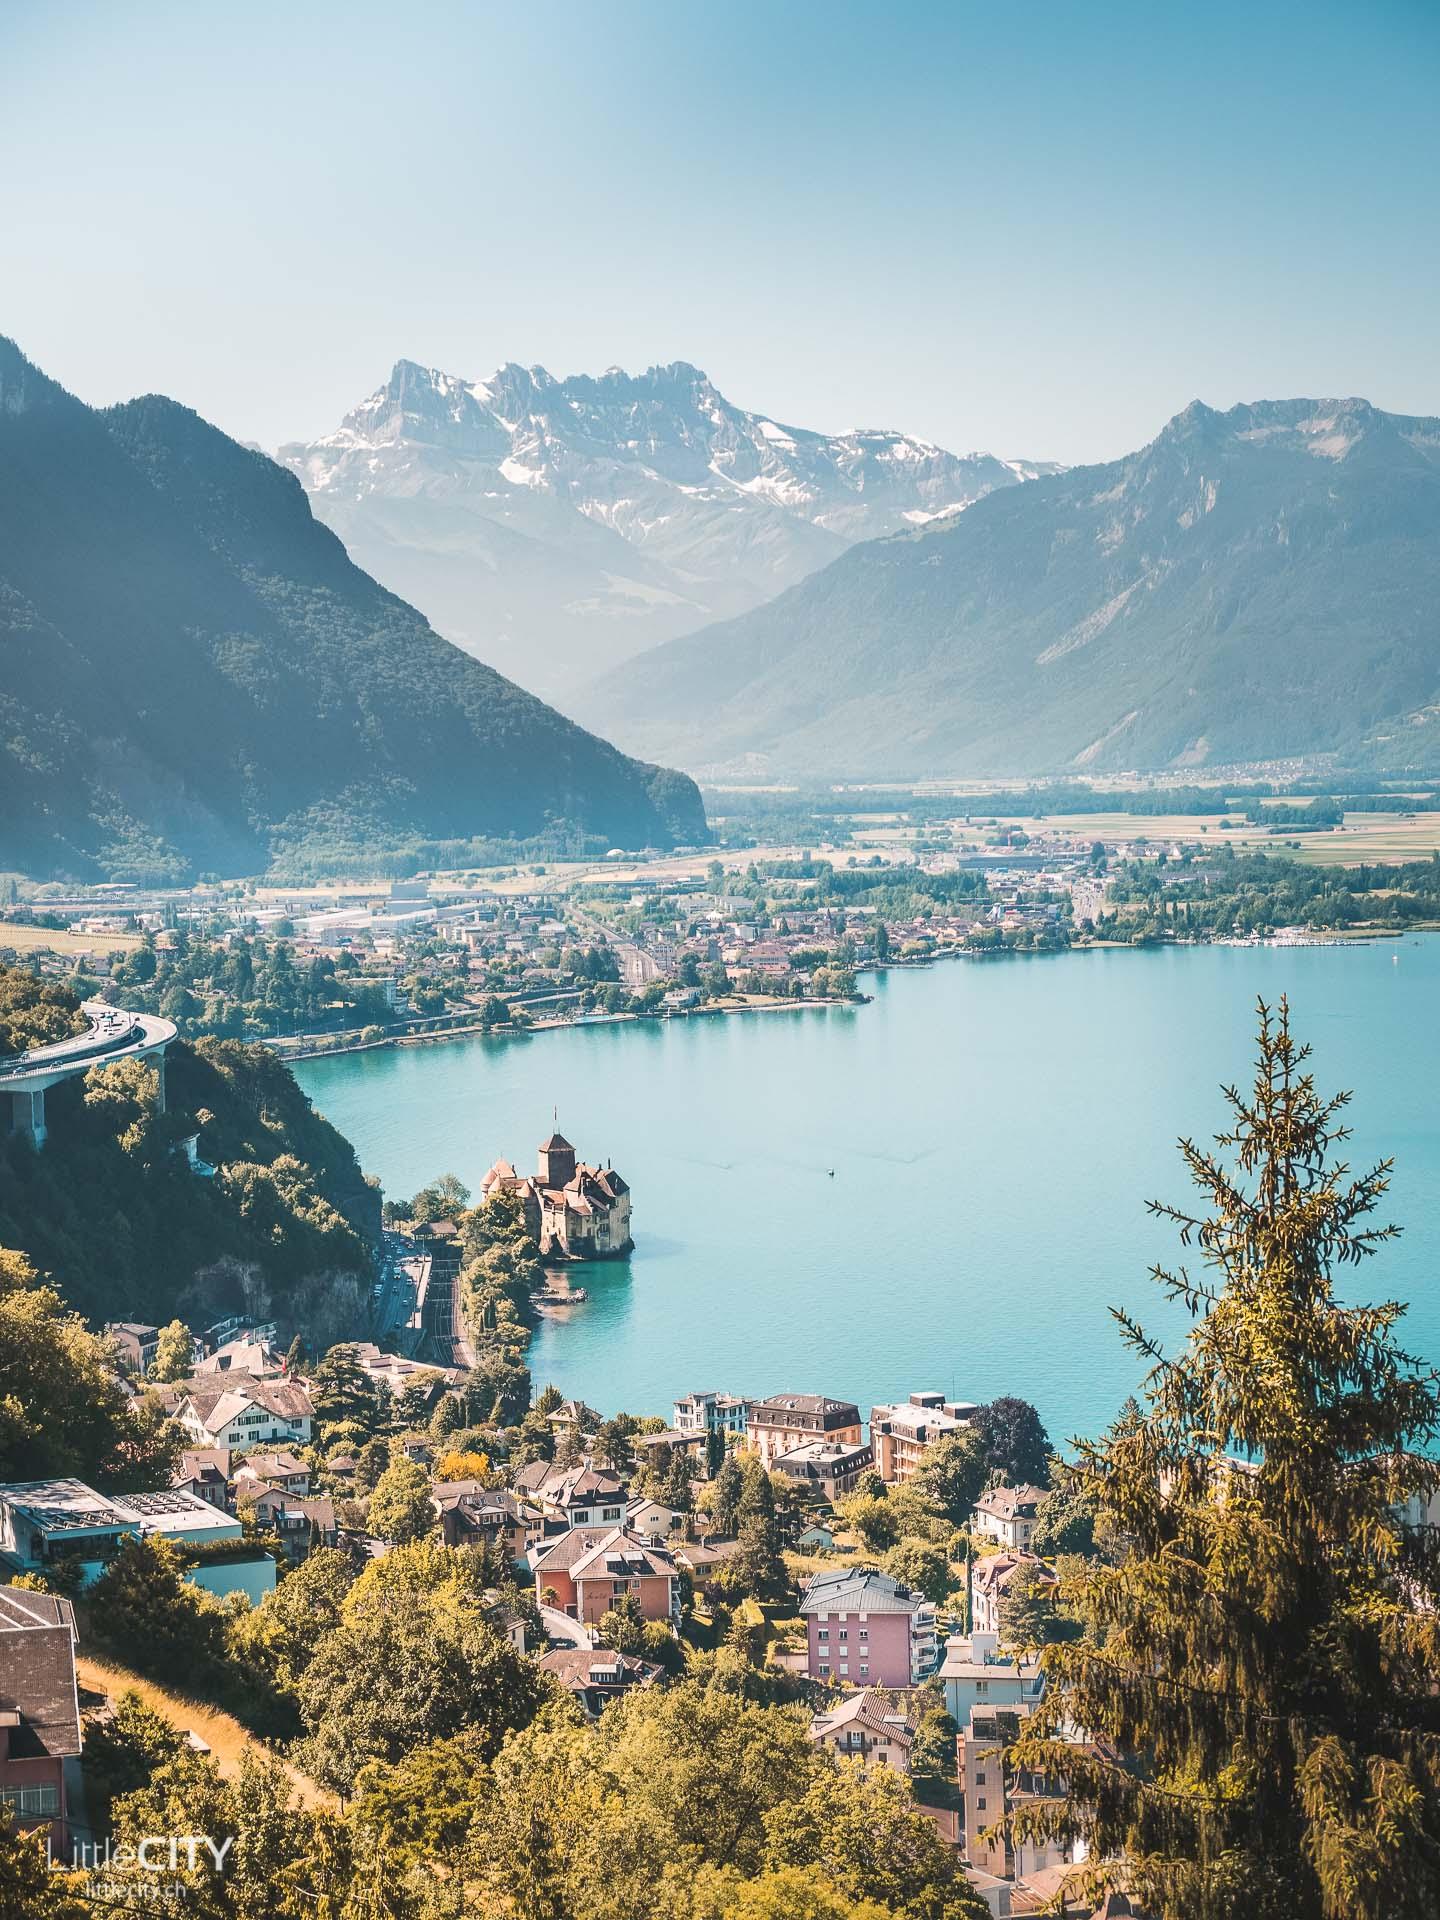 Rochers de Naye Ausflug Montreux Schloss Chillon